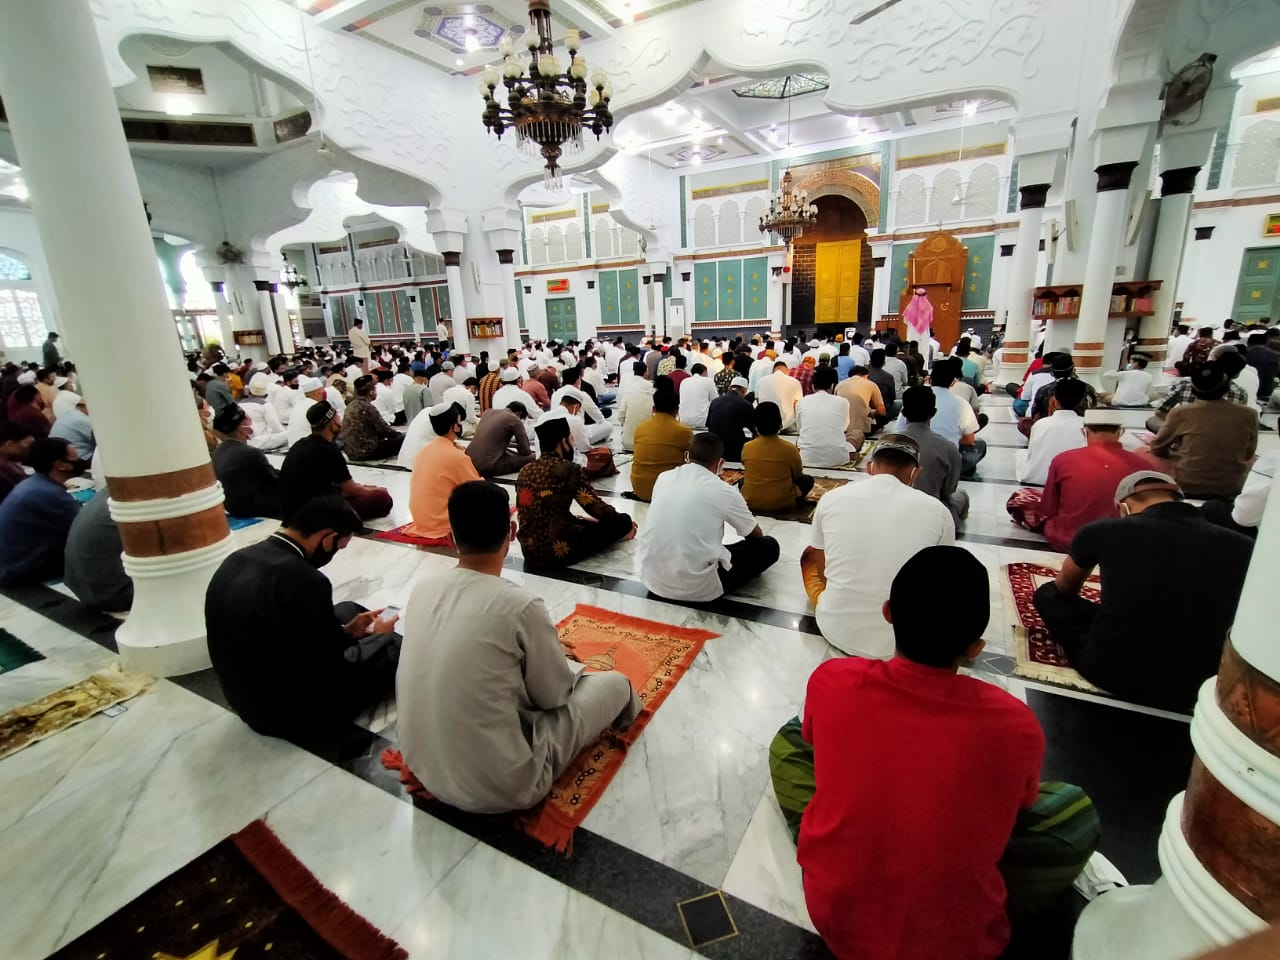 Ini Isi Khutbah Idul Adha di Masjid Raya Baiturrahman Banda Aceh